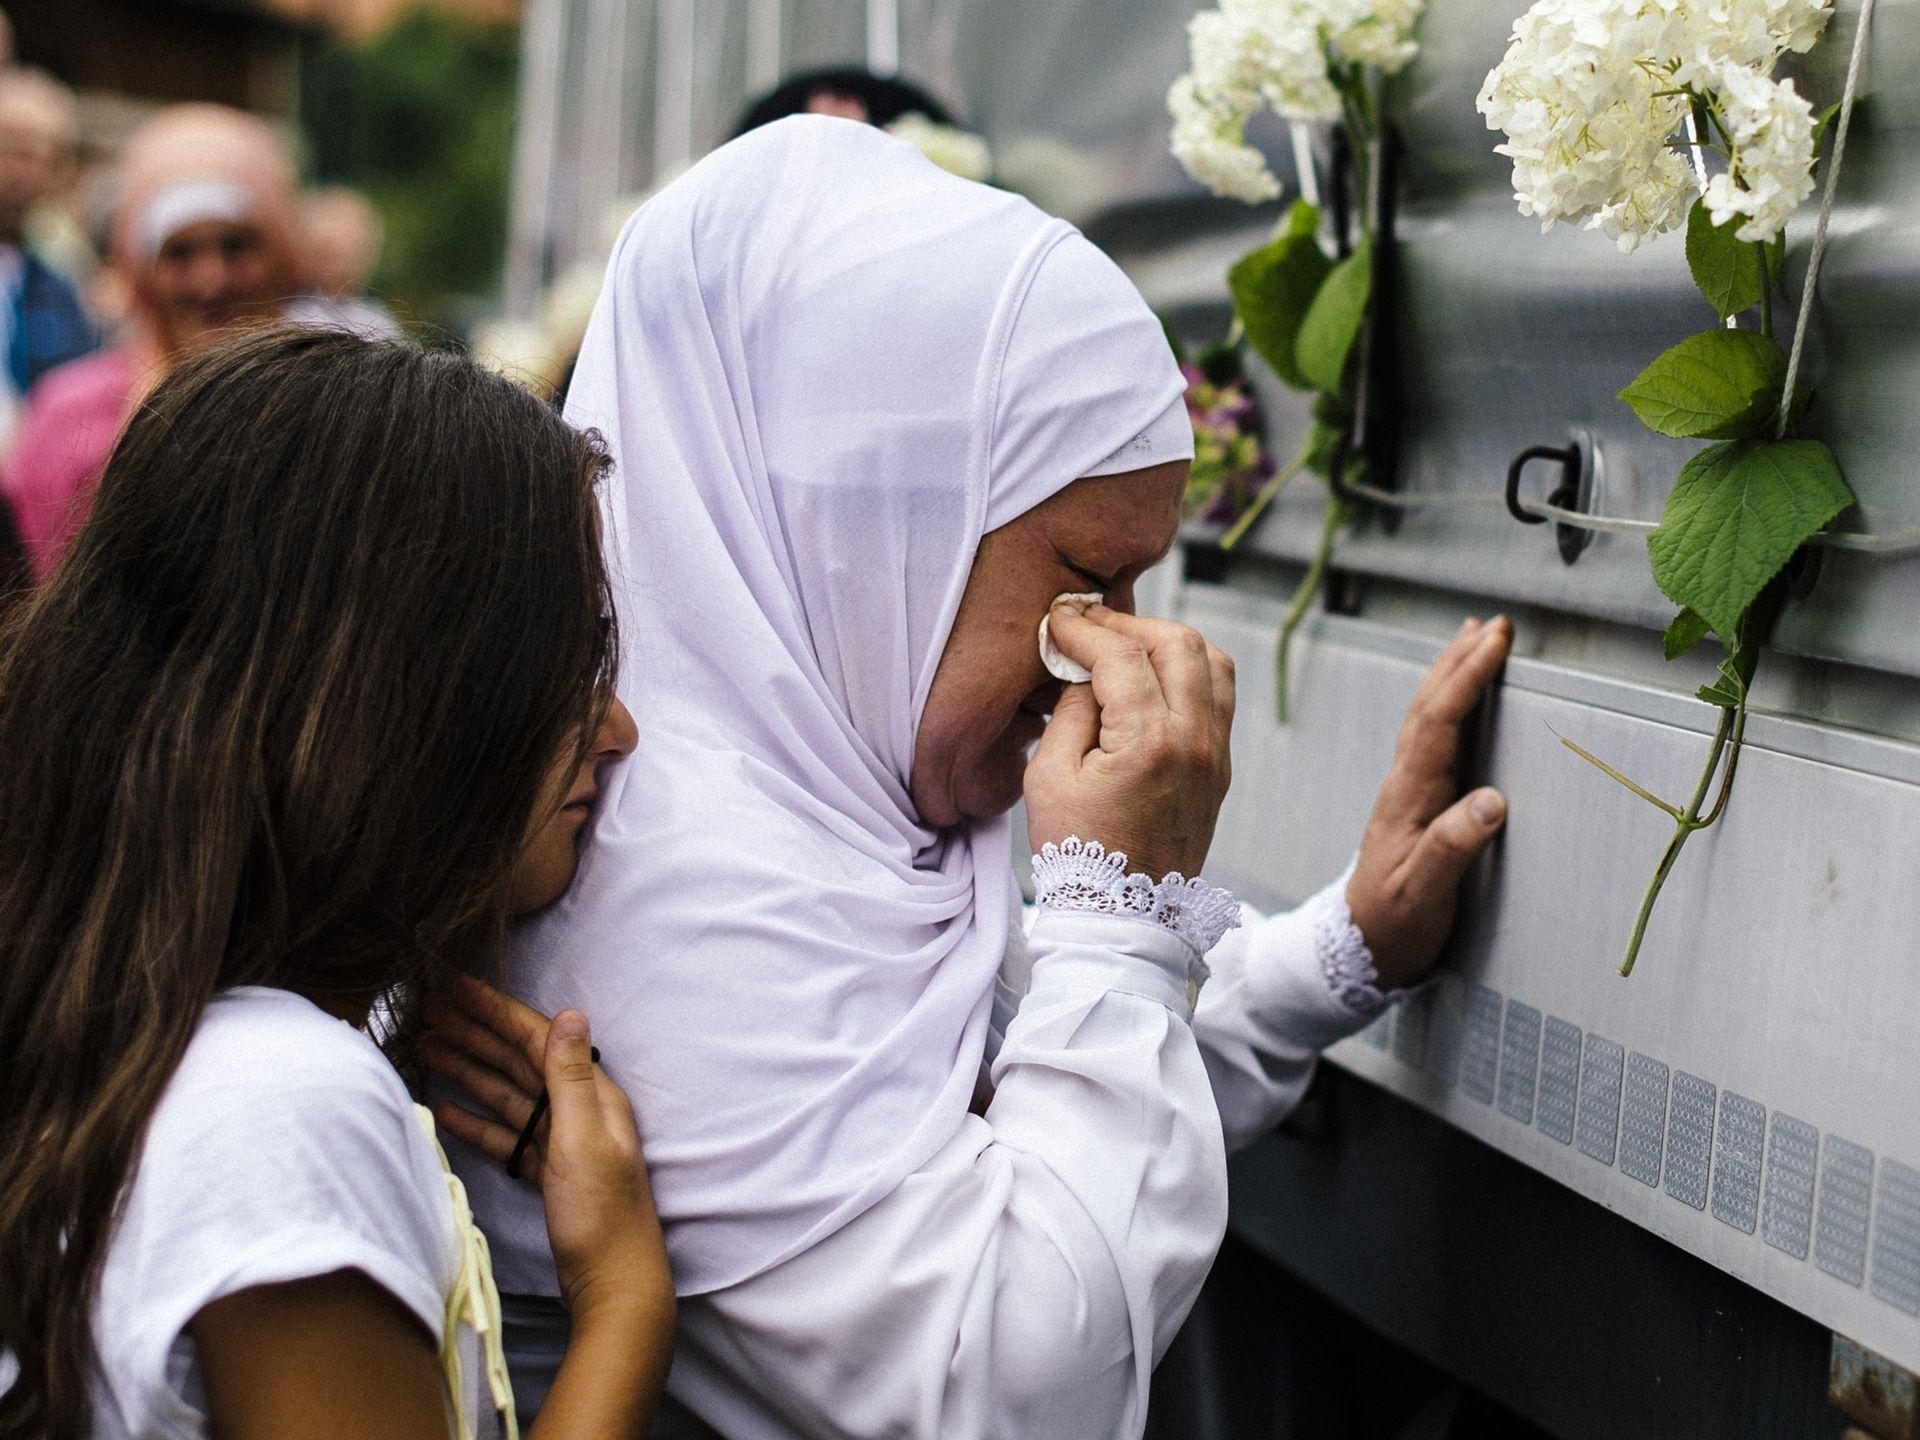 Bosnian Brides Meet Muslim Single Women for Marriage - Global Seducer